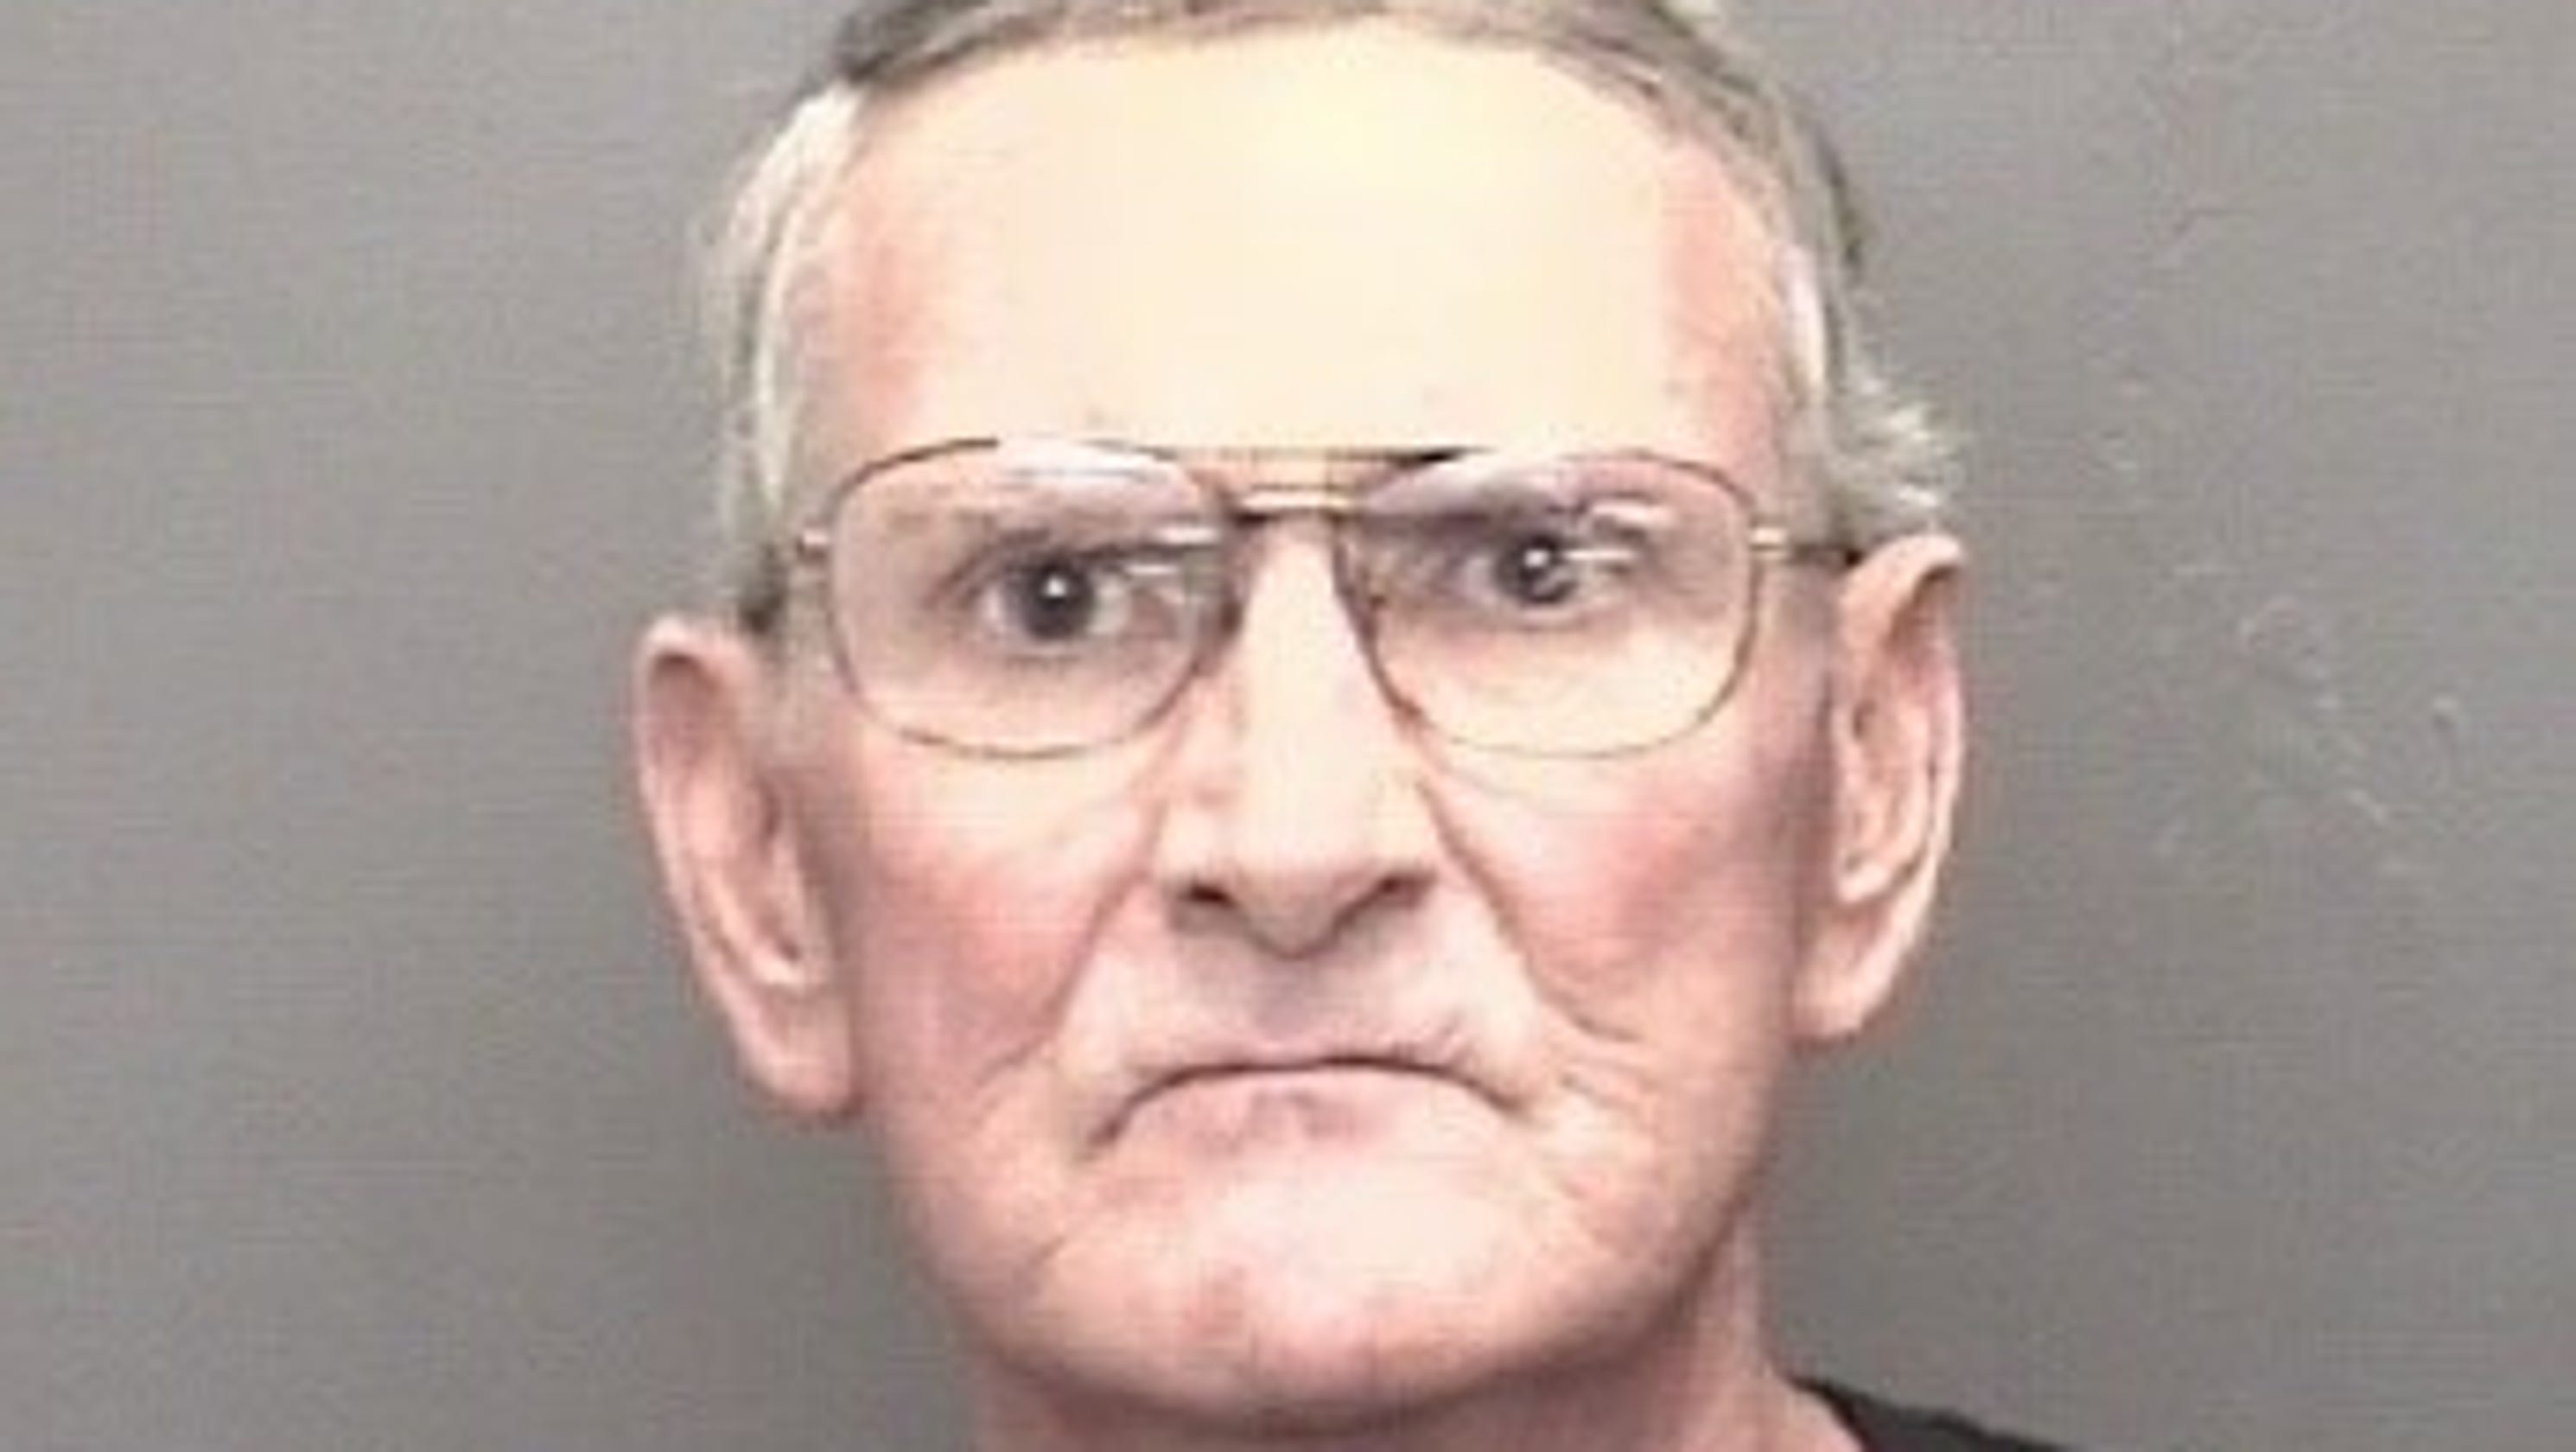 Judge: Evansville Police can keep guns seized under Red Flag Law